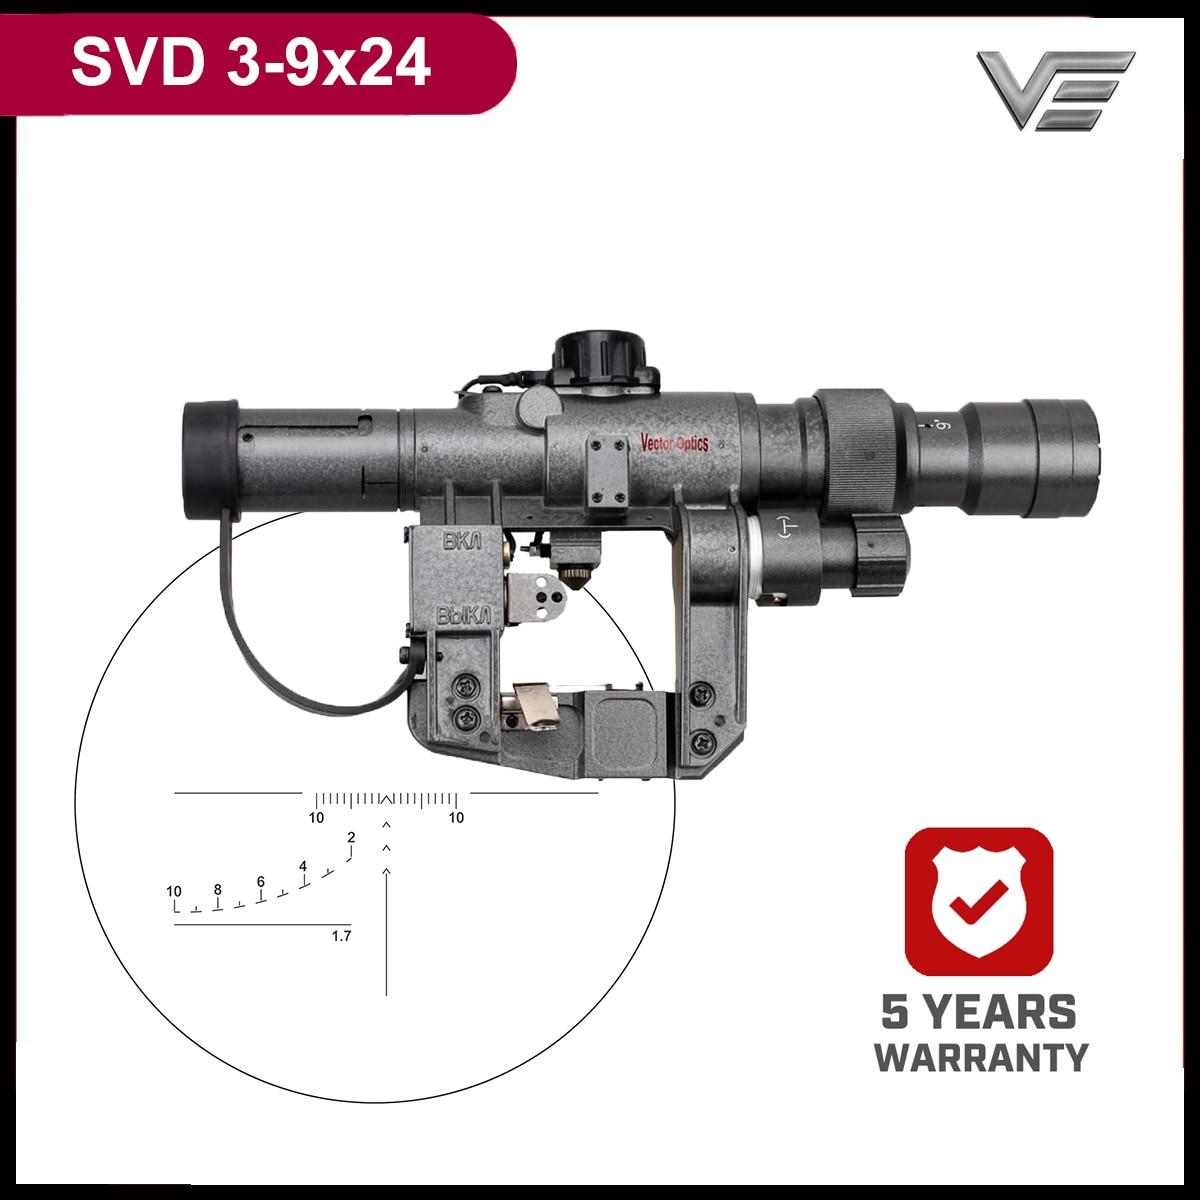 Tactical Dragunov 3-9x 24mm SVD Tactical Military FFP RifleScope Fit AK47 AK74 Shockproof Waterproof Brand New Gunsight Scope